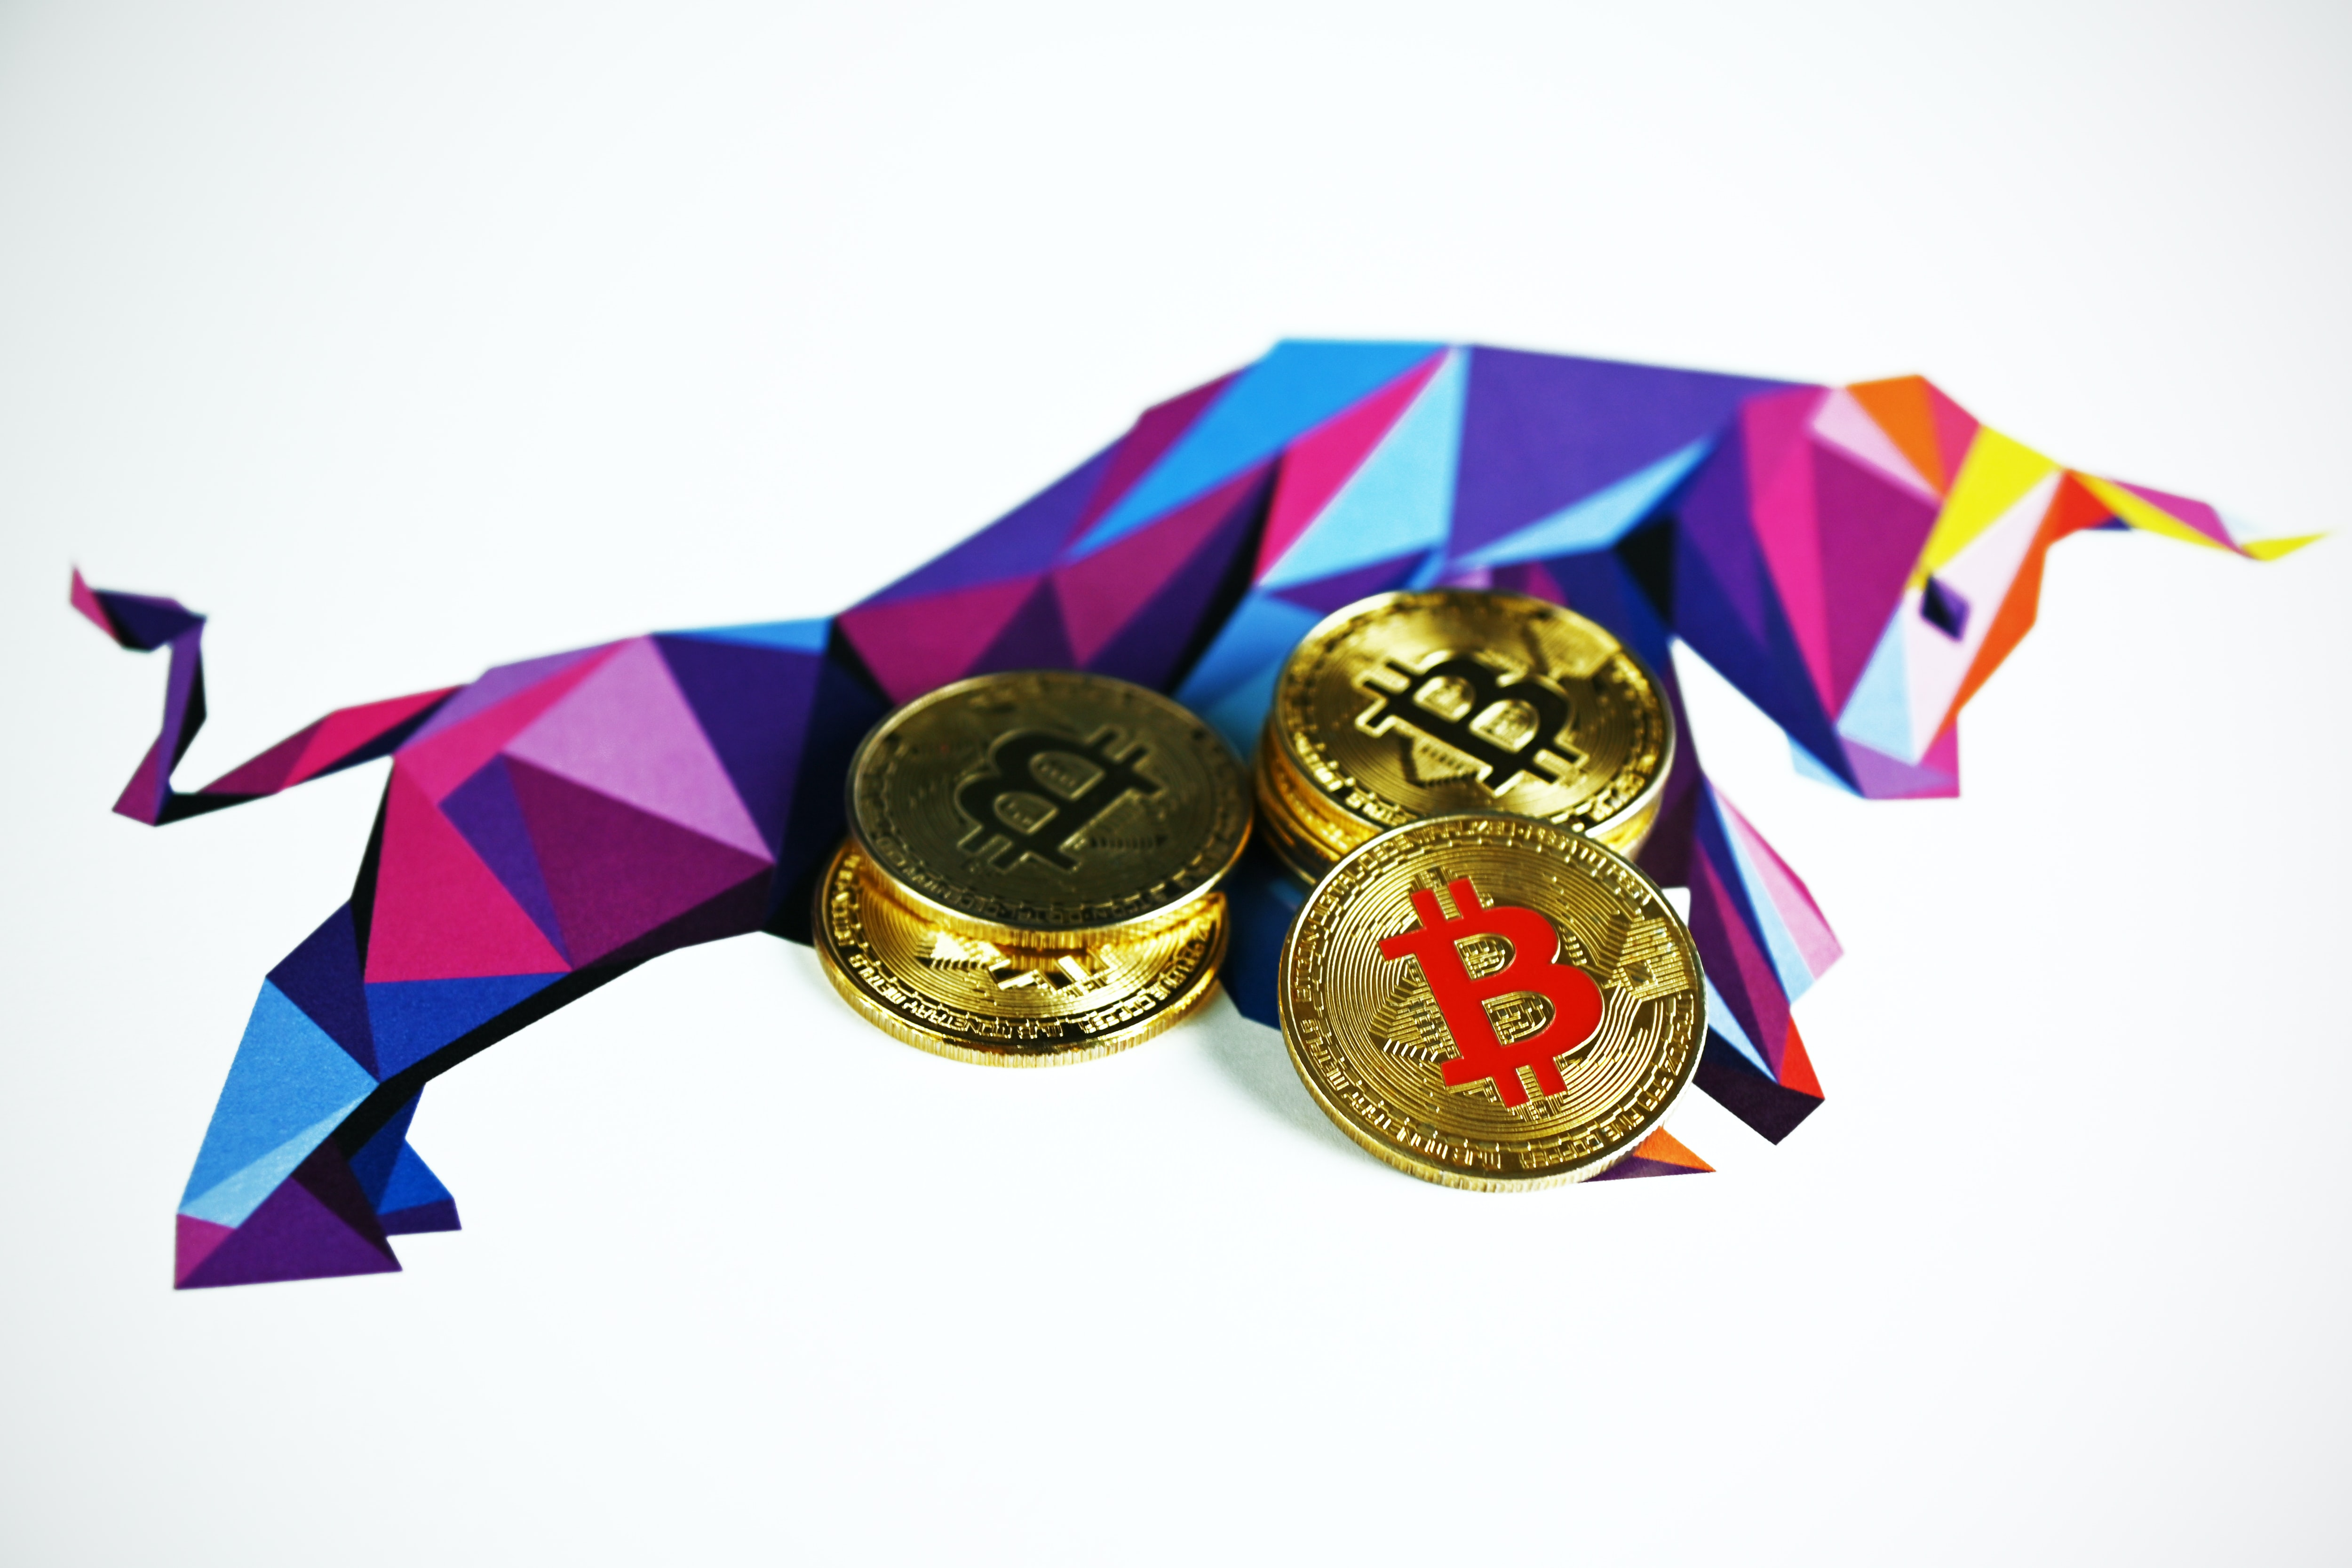 Bitcoin Nears $43k, Indicators Suggest Bull Market Ahead